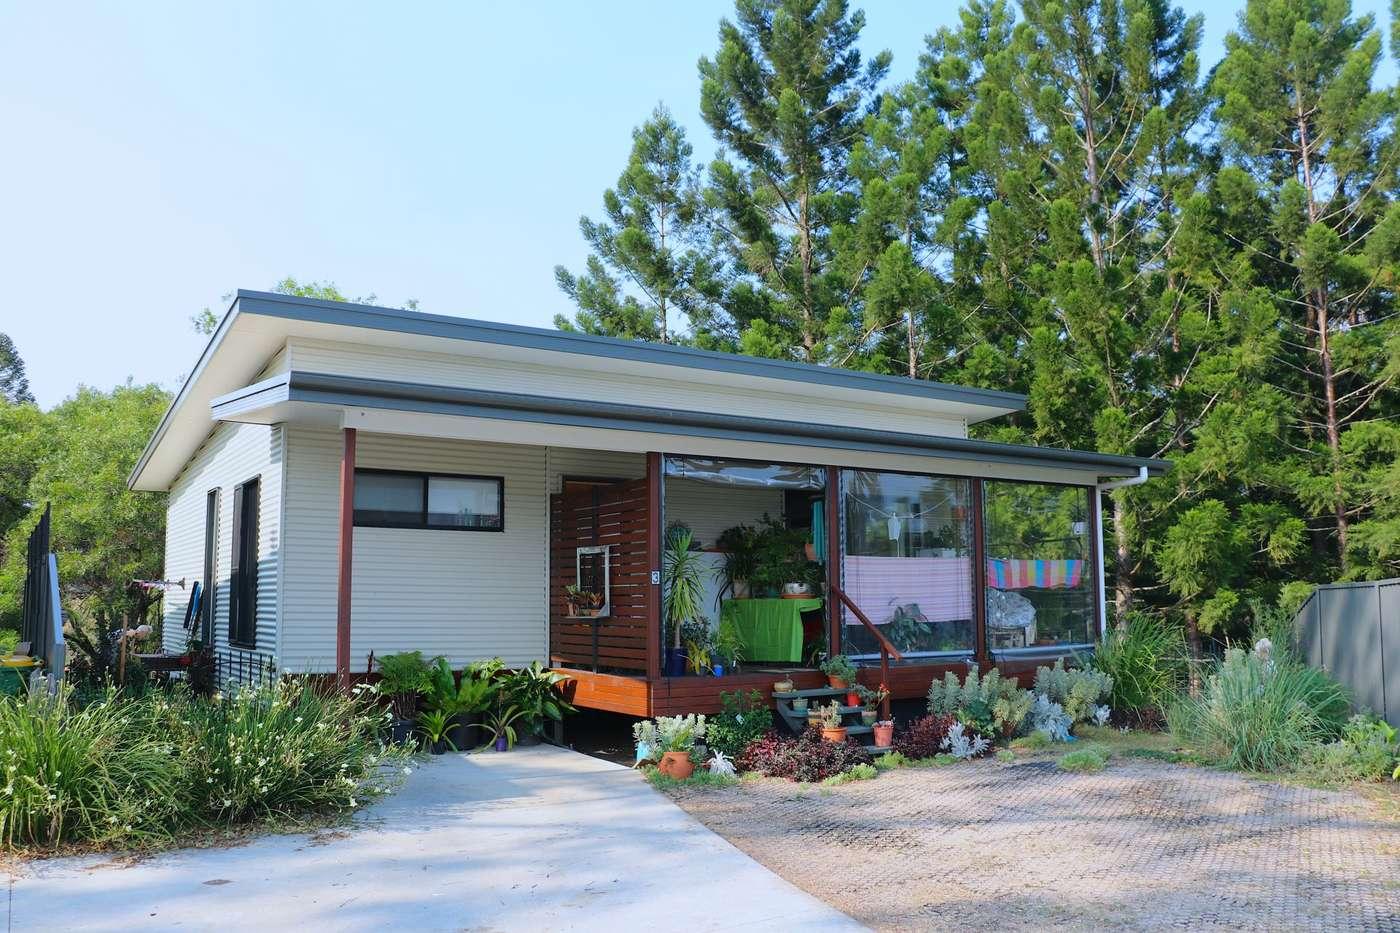 Main view of Homely unit listing, 3/27 Alternative Way, Nimbin, NSW 2480